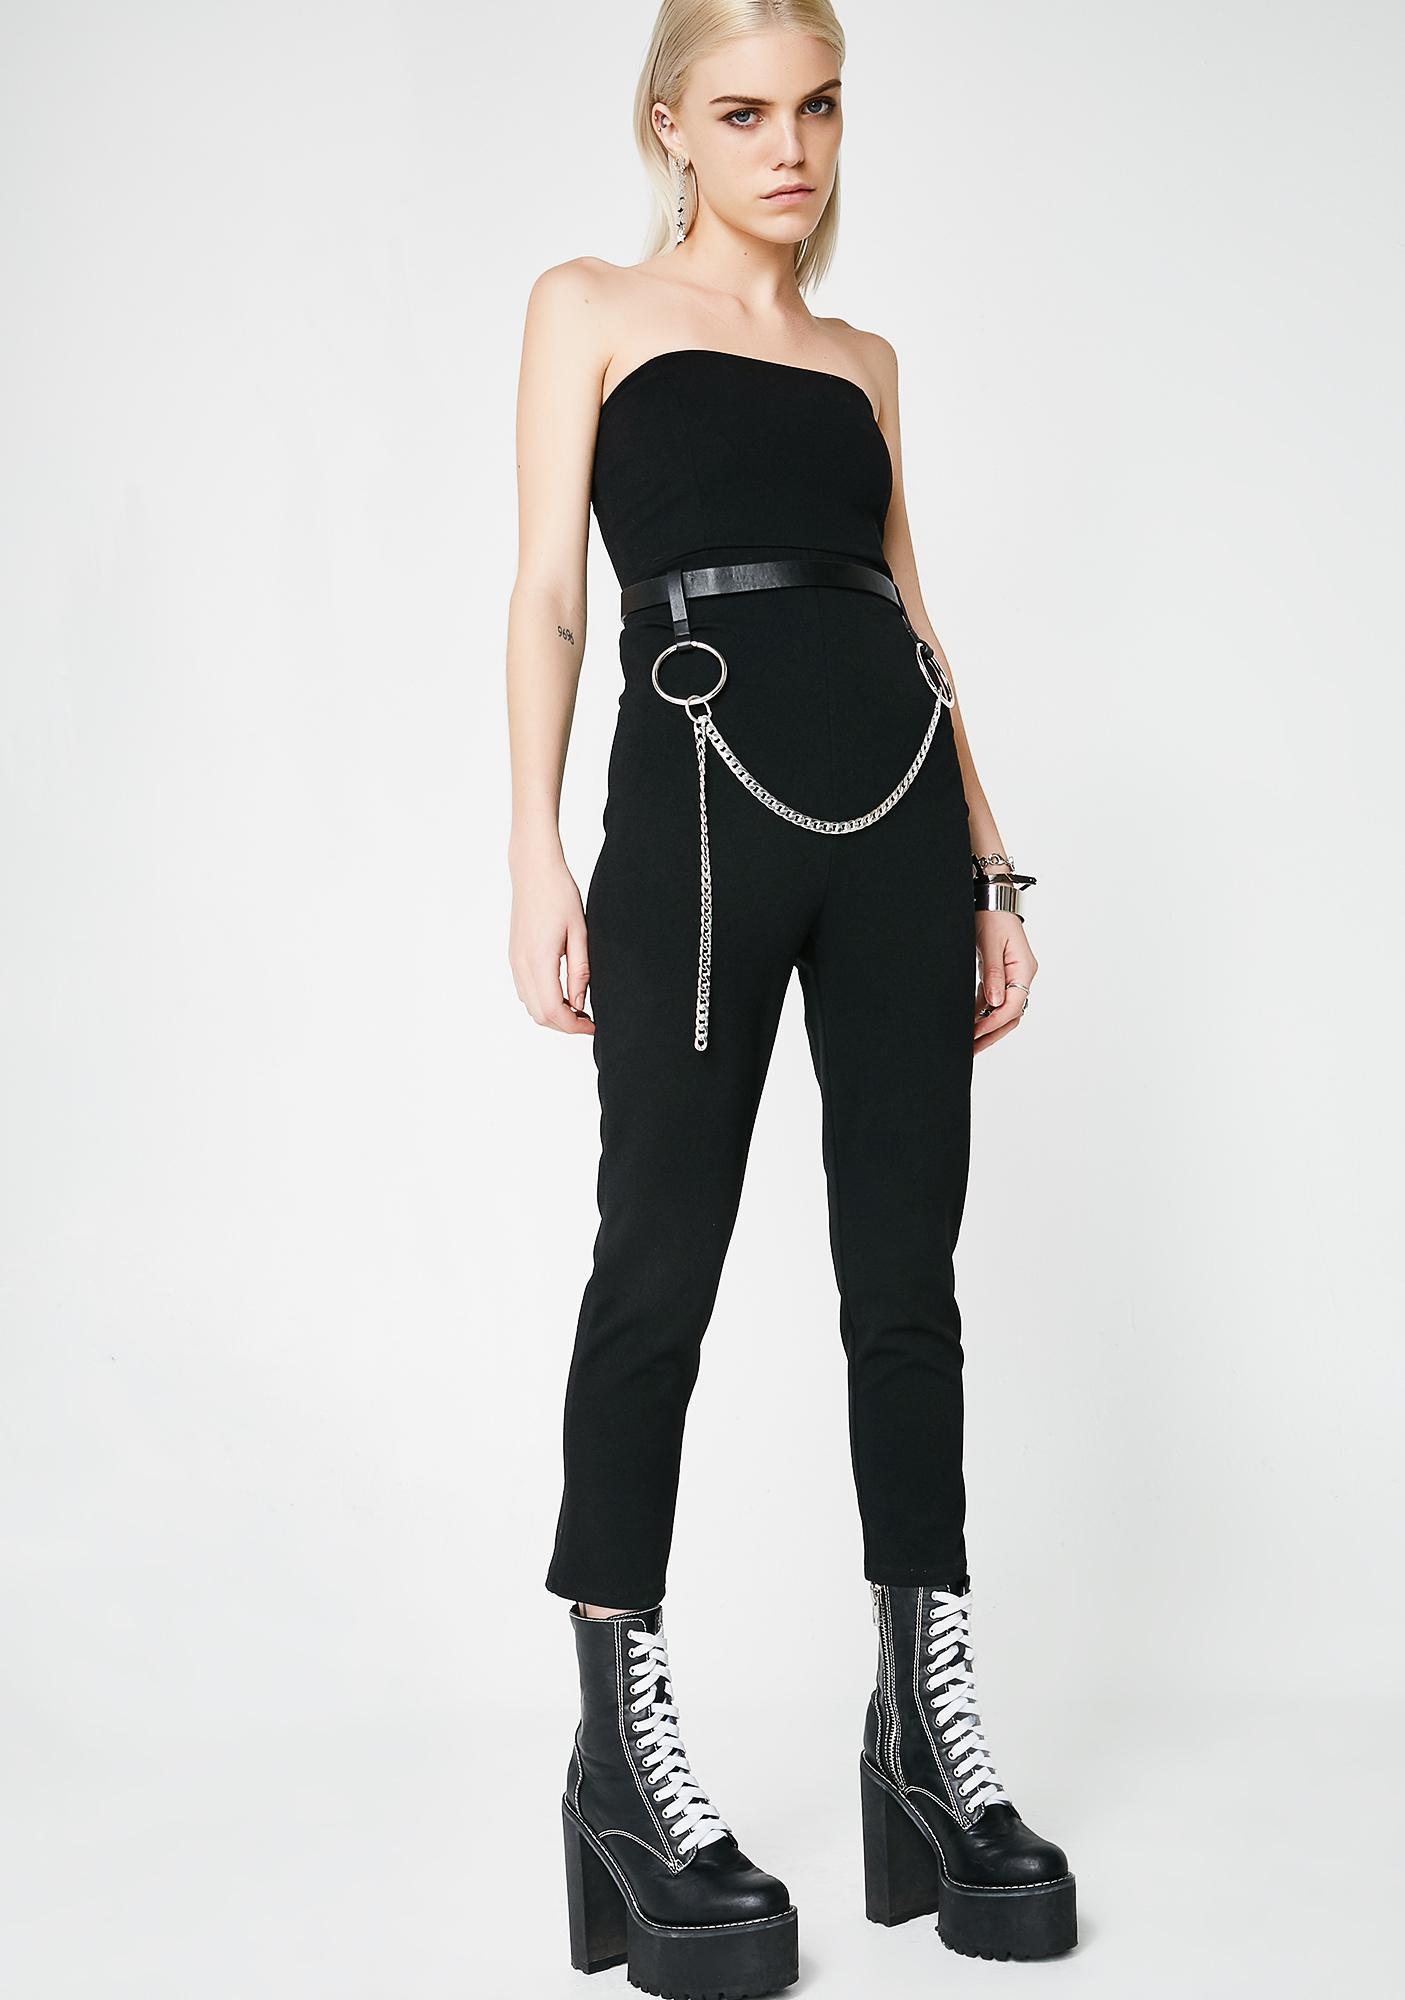 Lose Control Strapless Jumpsuit